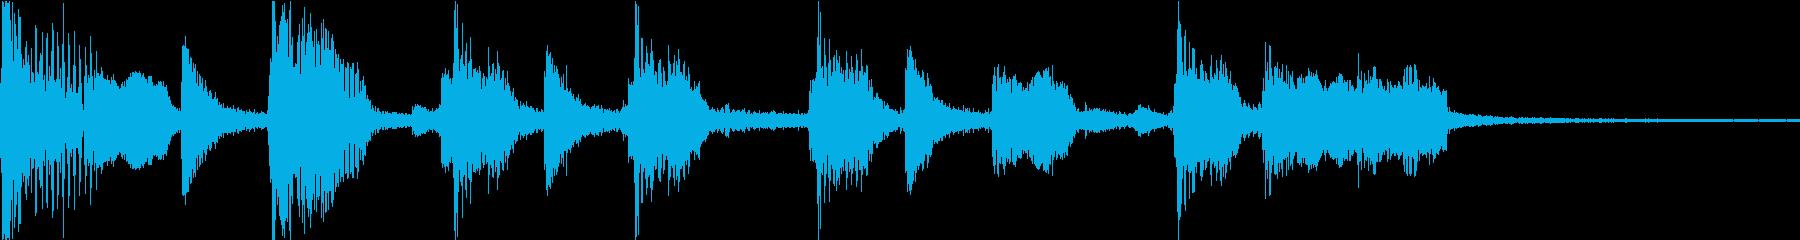 T.V.現代の現実。弾力性のあるコ...の再生済みの波形